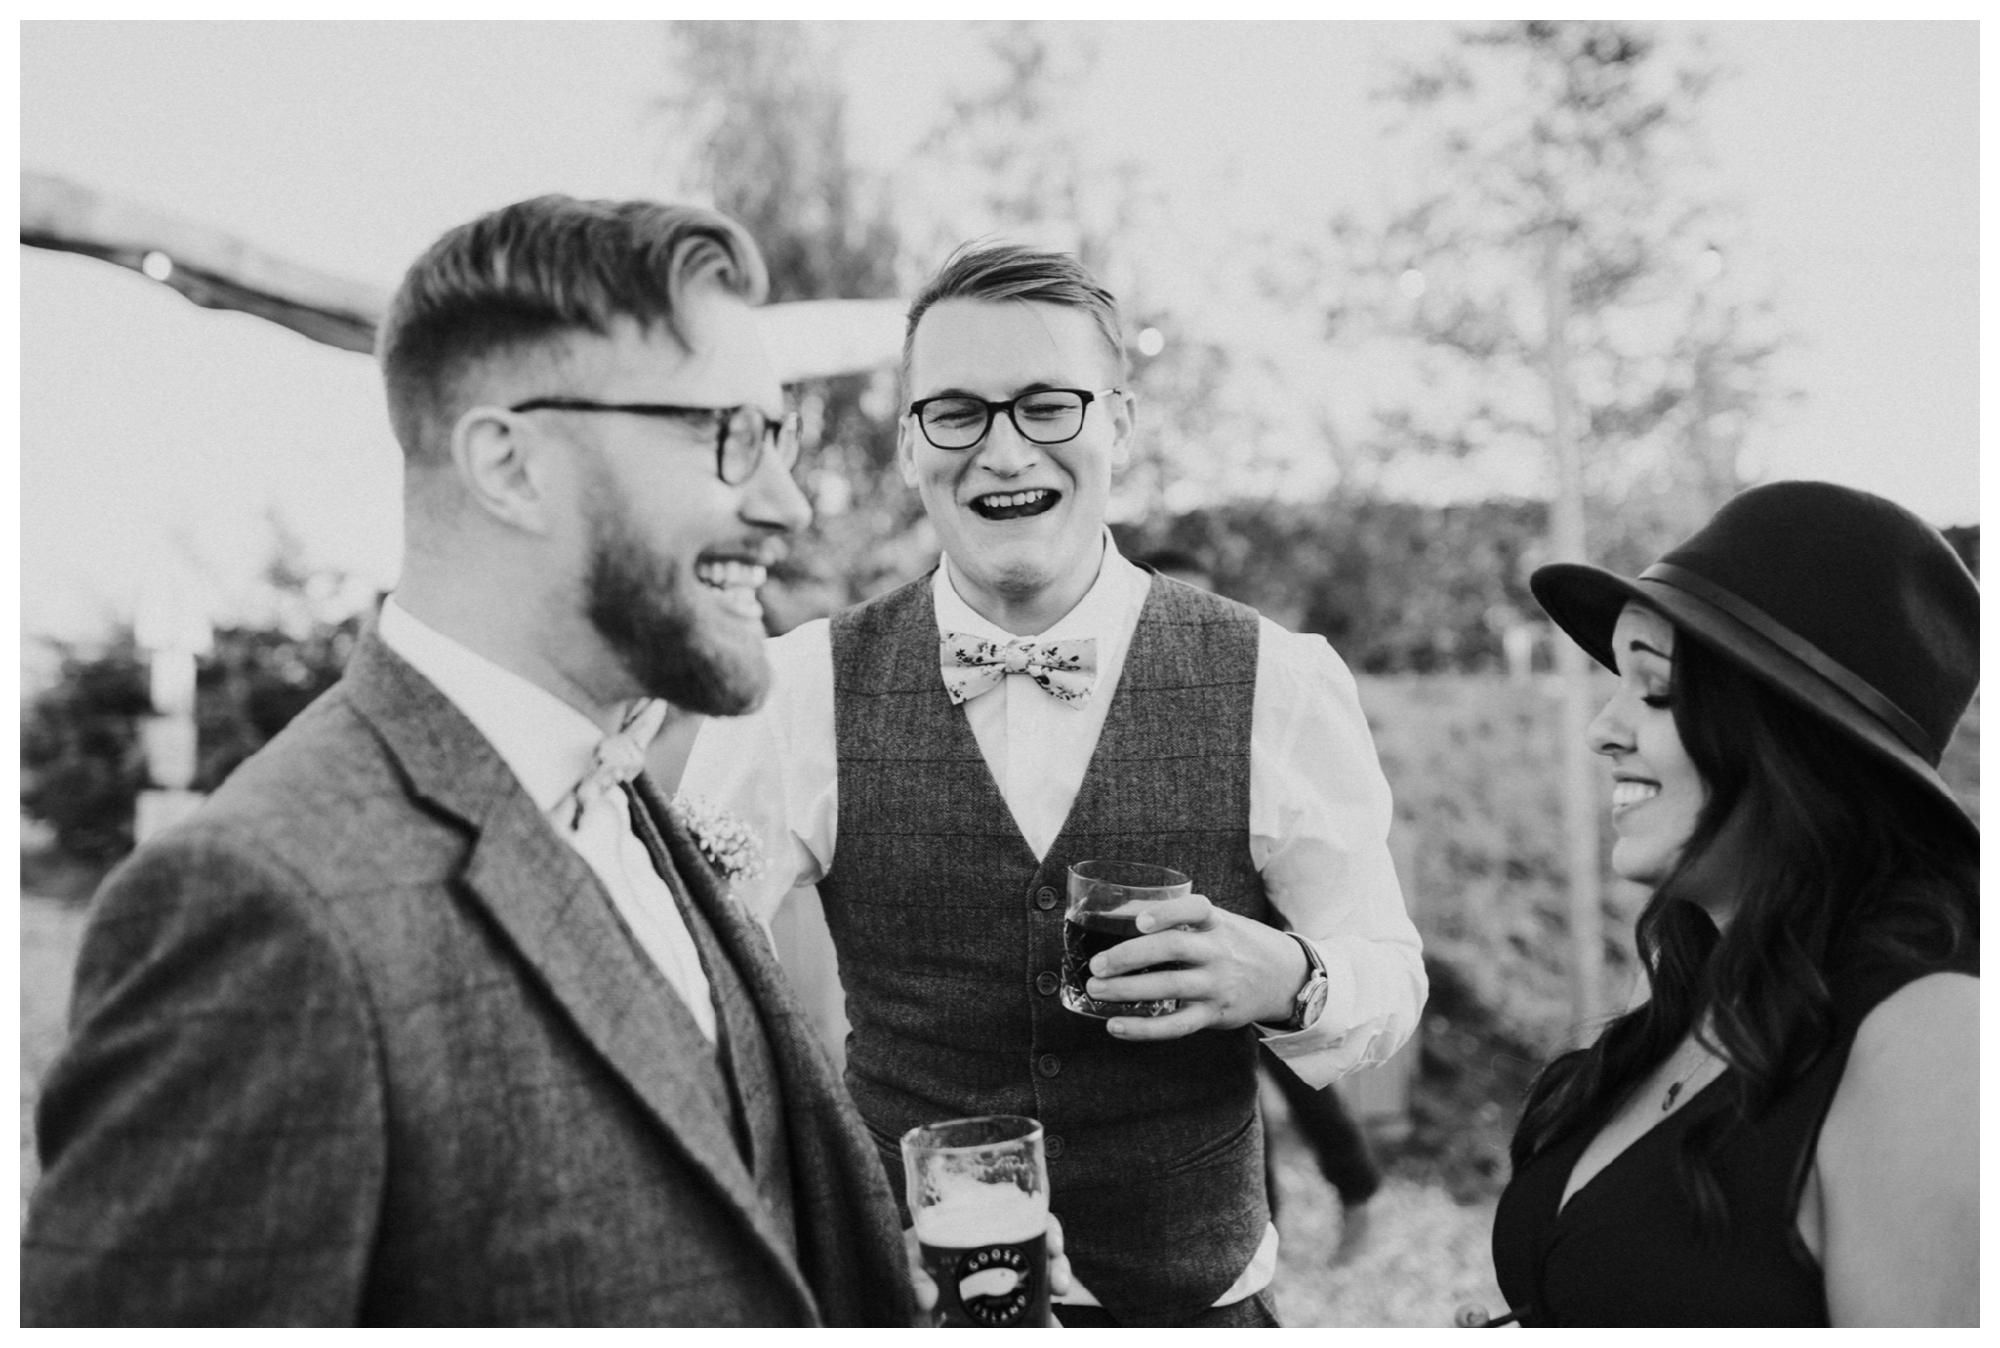 InkersgallGrangeFarm-LukeHolroyd-Yorkshirewedding_0142.jpg